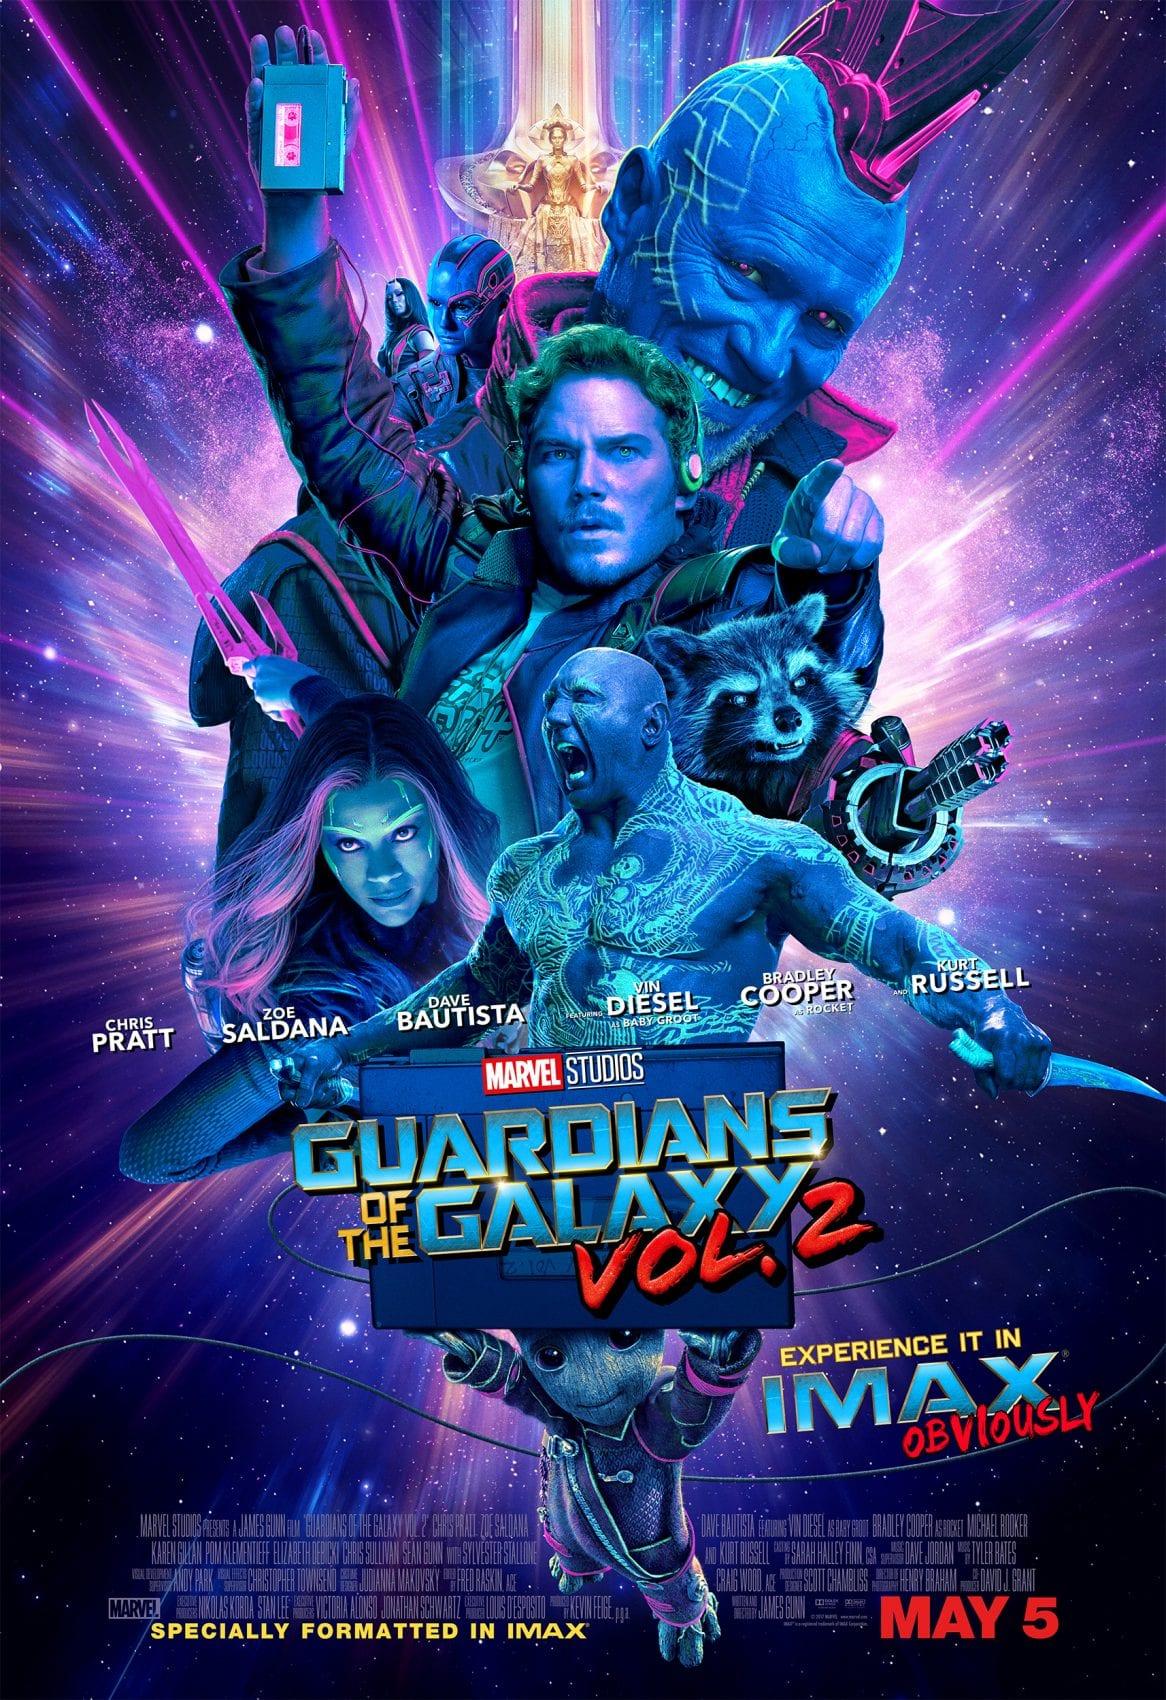 REVIEW – Les Gardiens de la Galaxie Vol.2